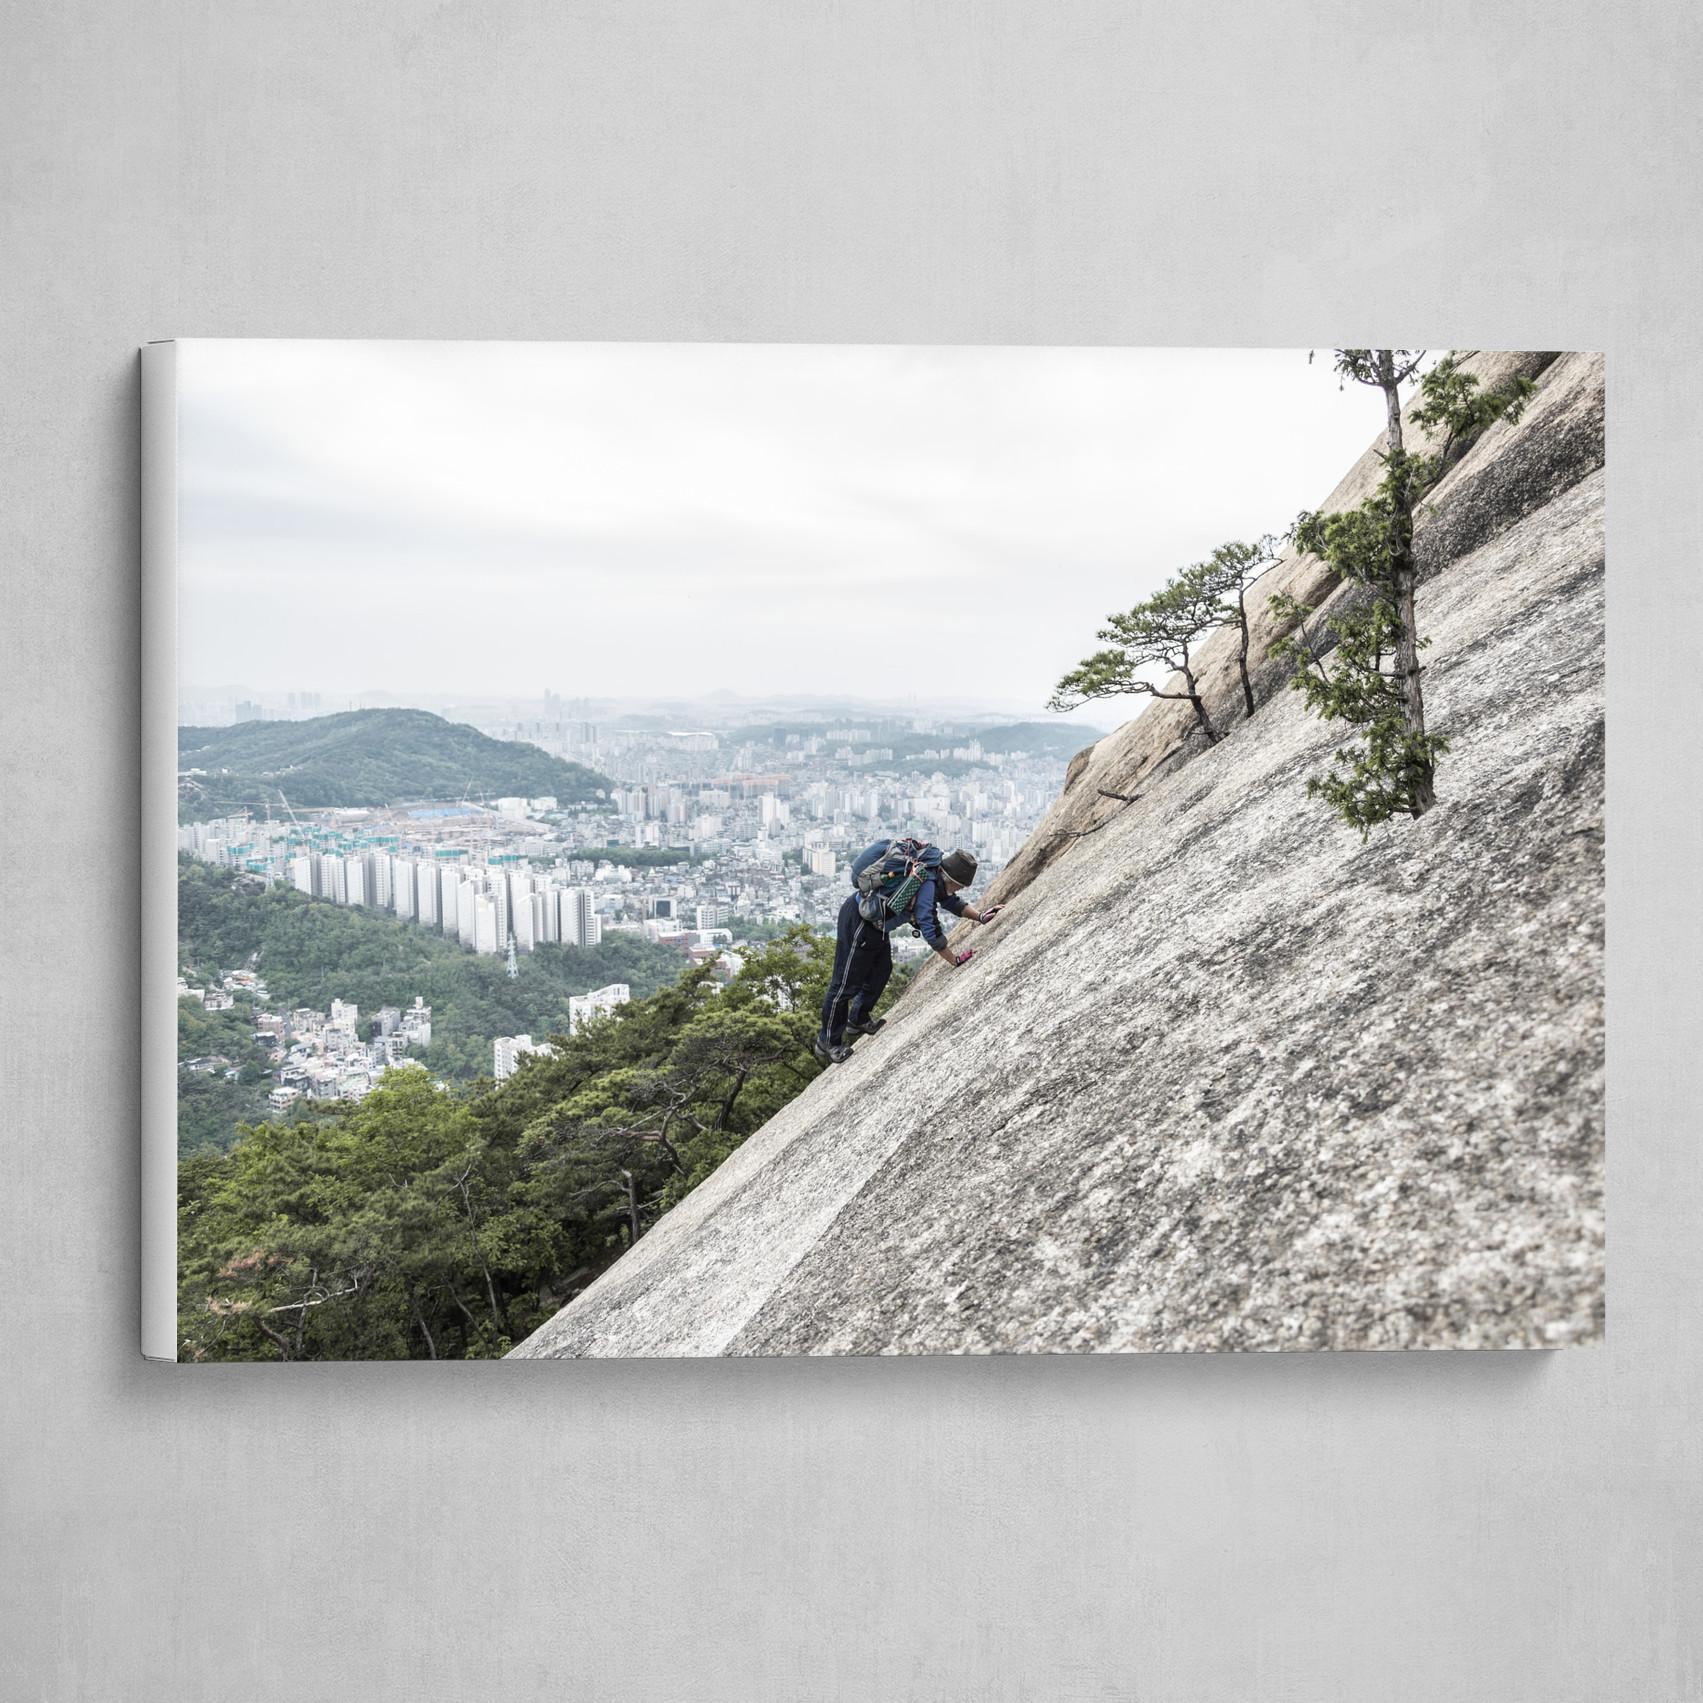 Hiking or Climbing ?